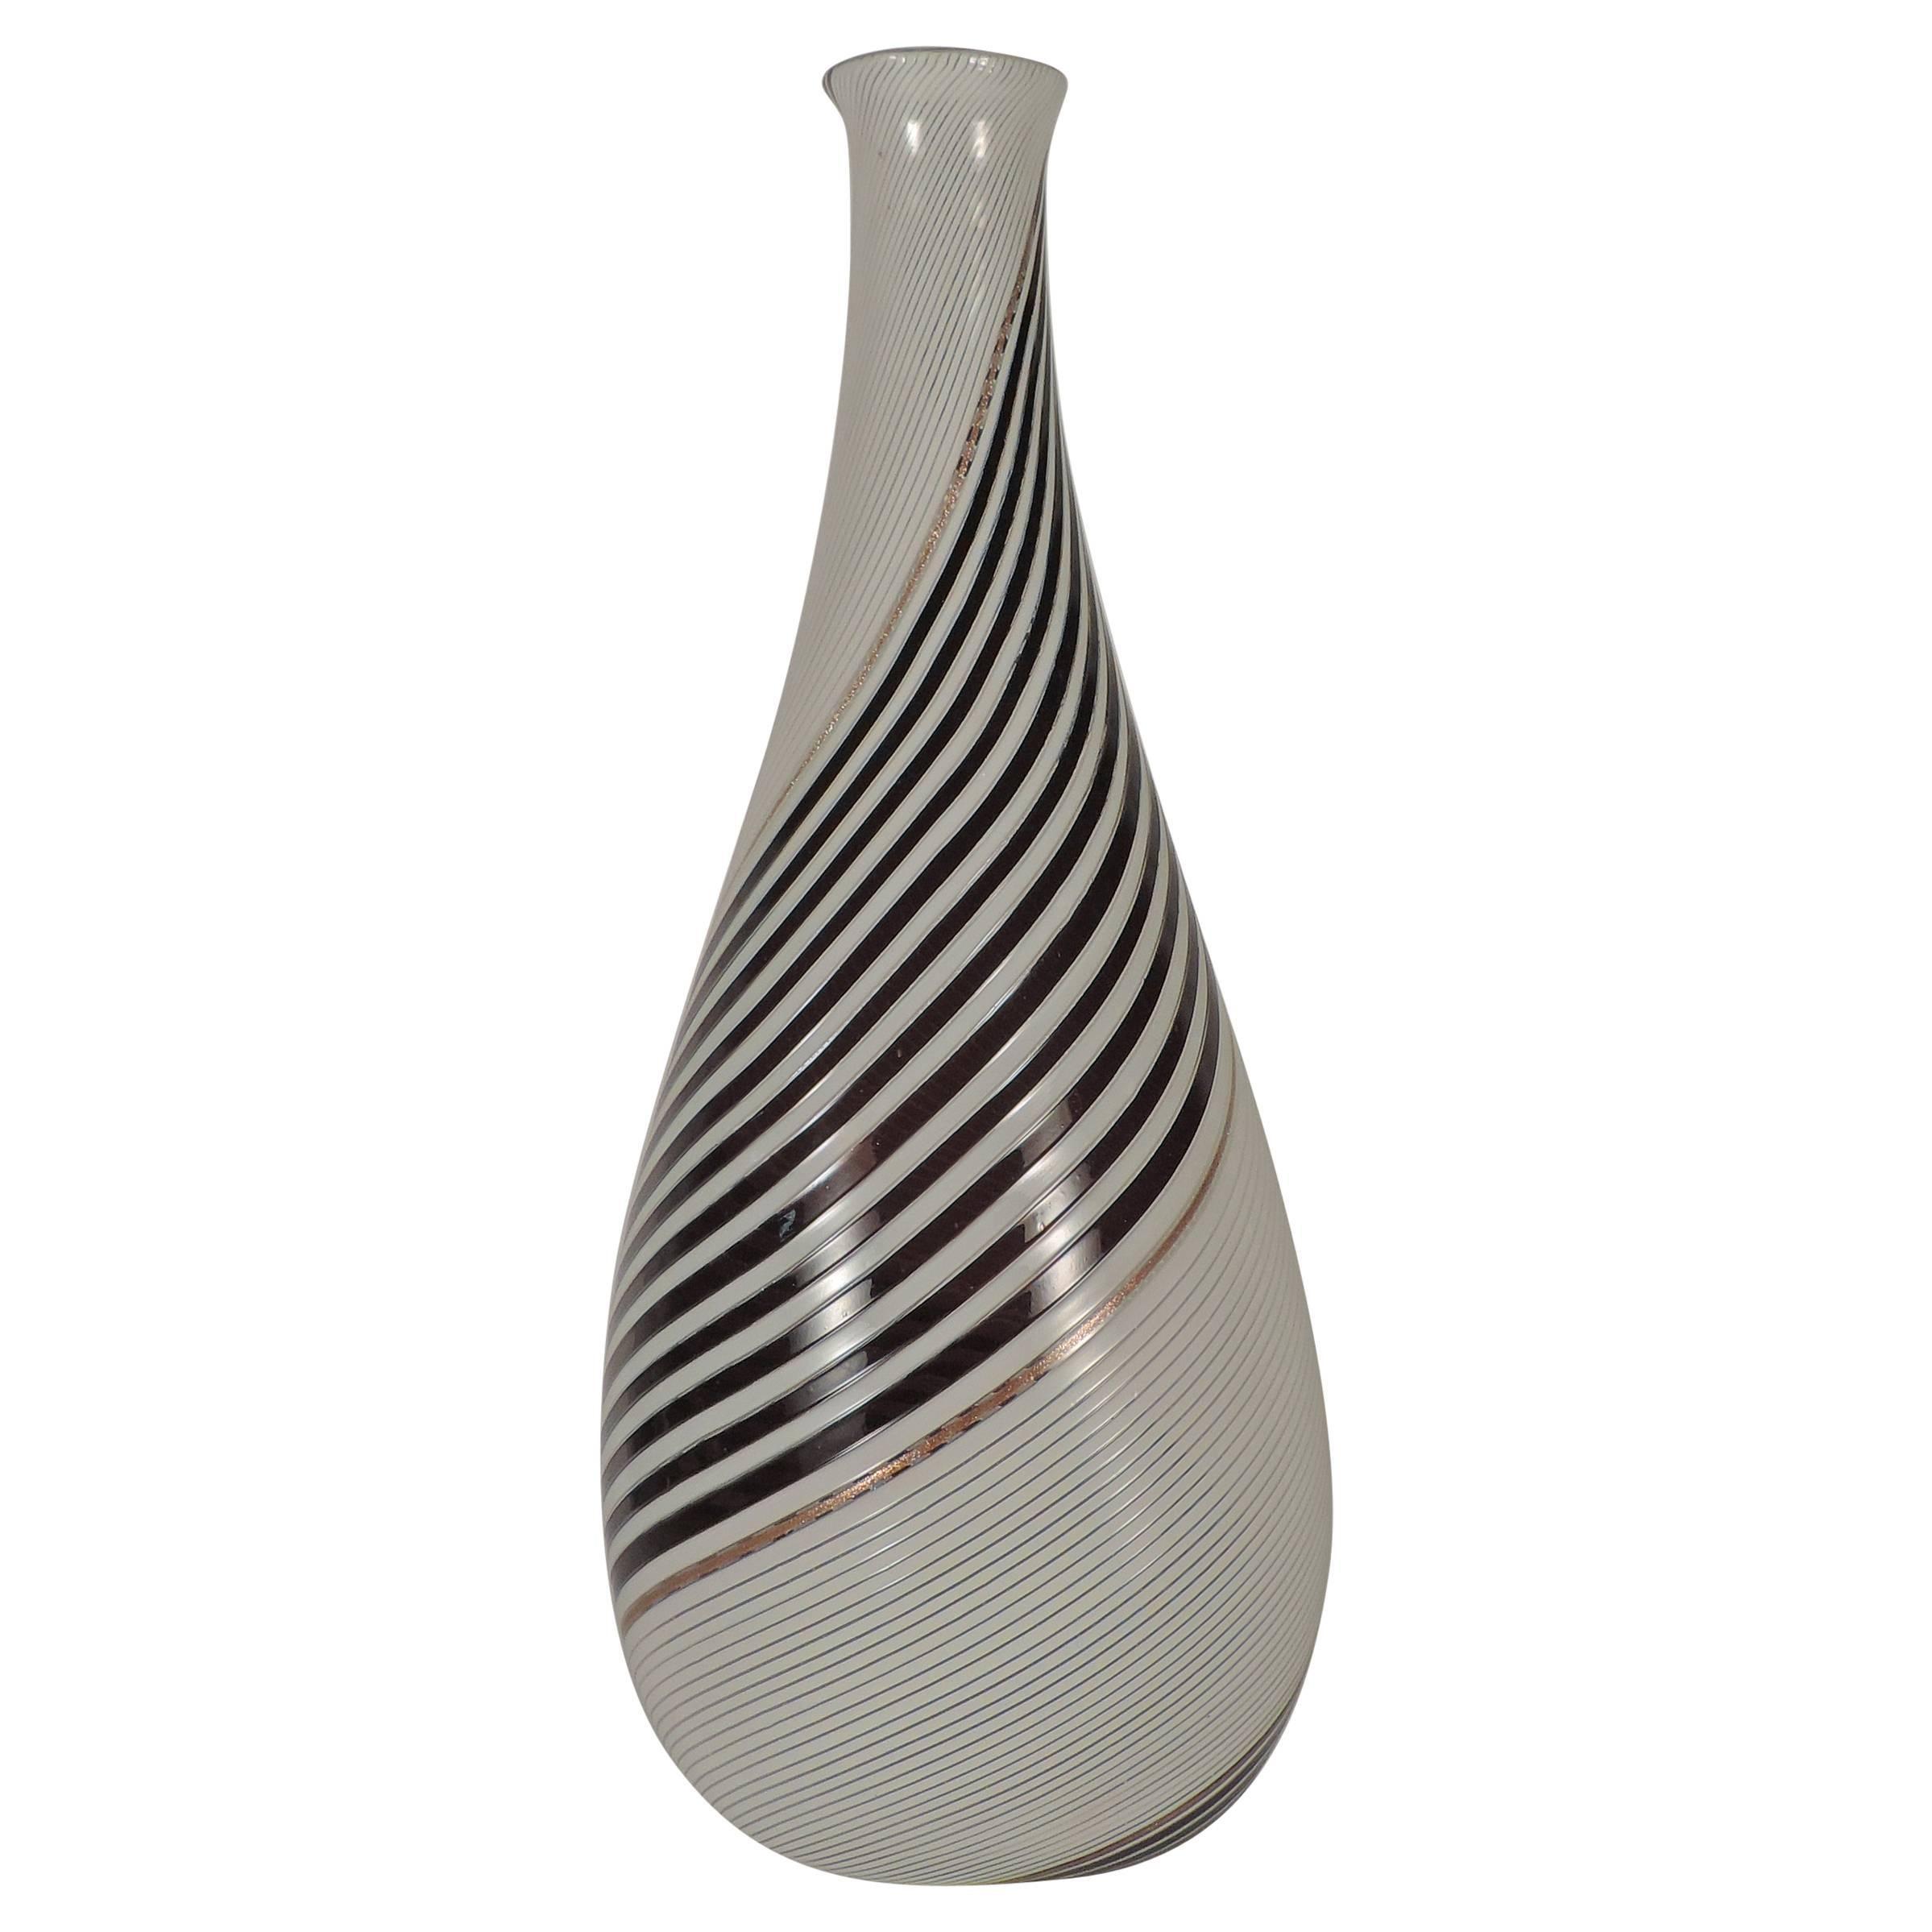 Splendid Large Dino Martens Vase for Aureliano Toso